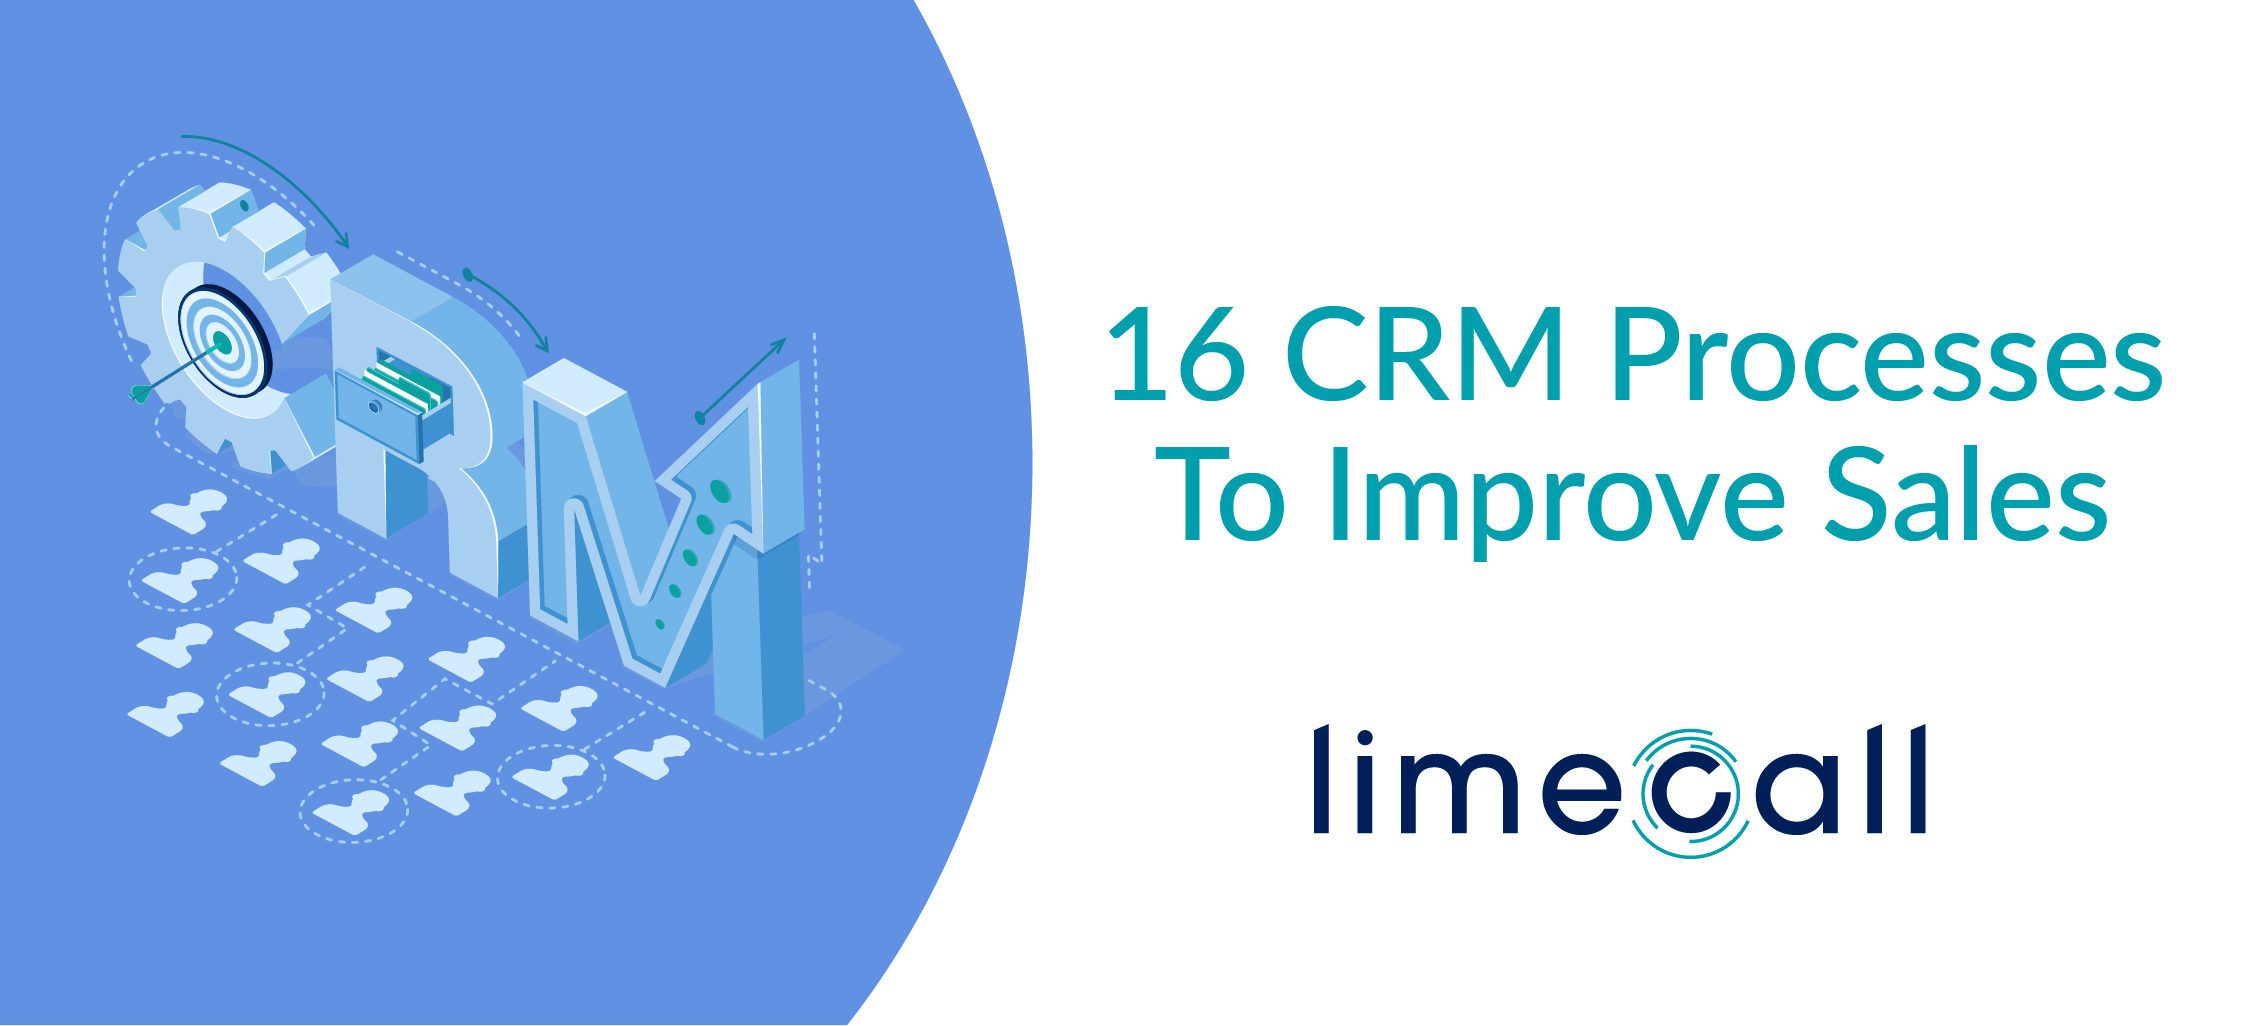 CRM Processes To Improve Sales